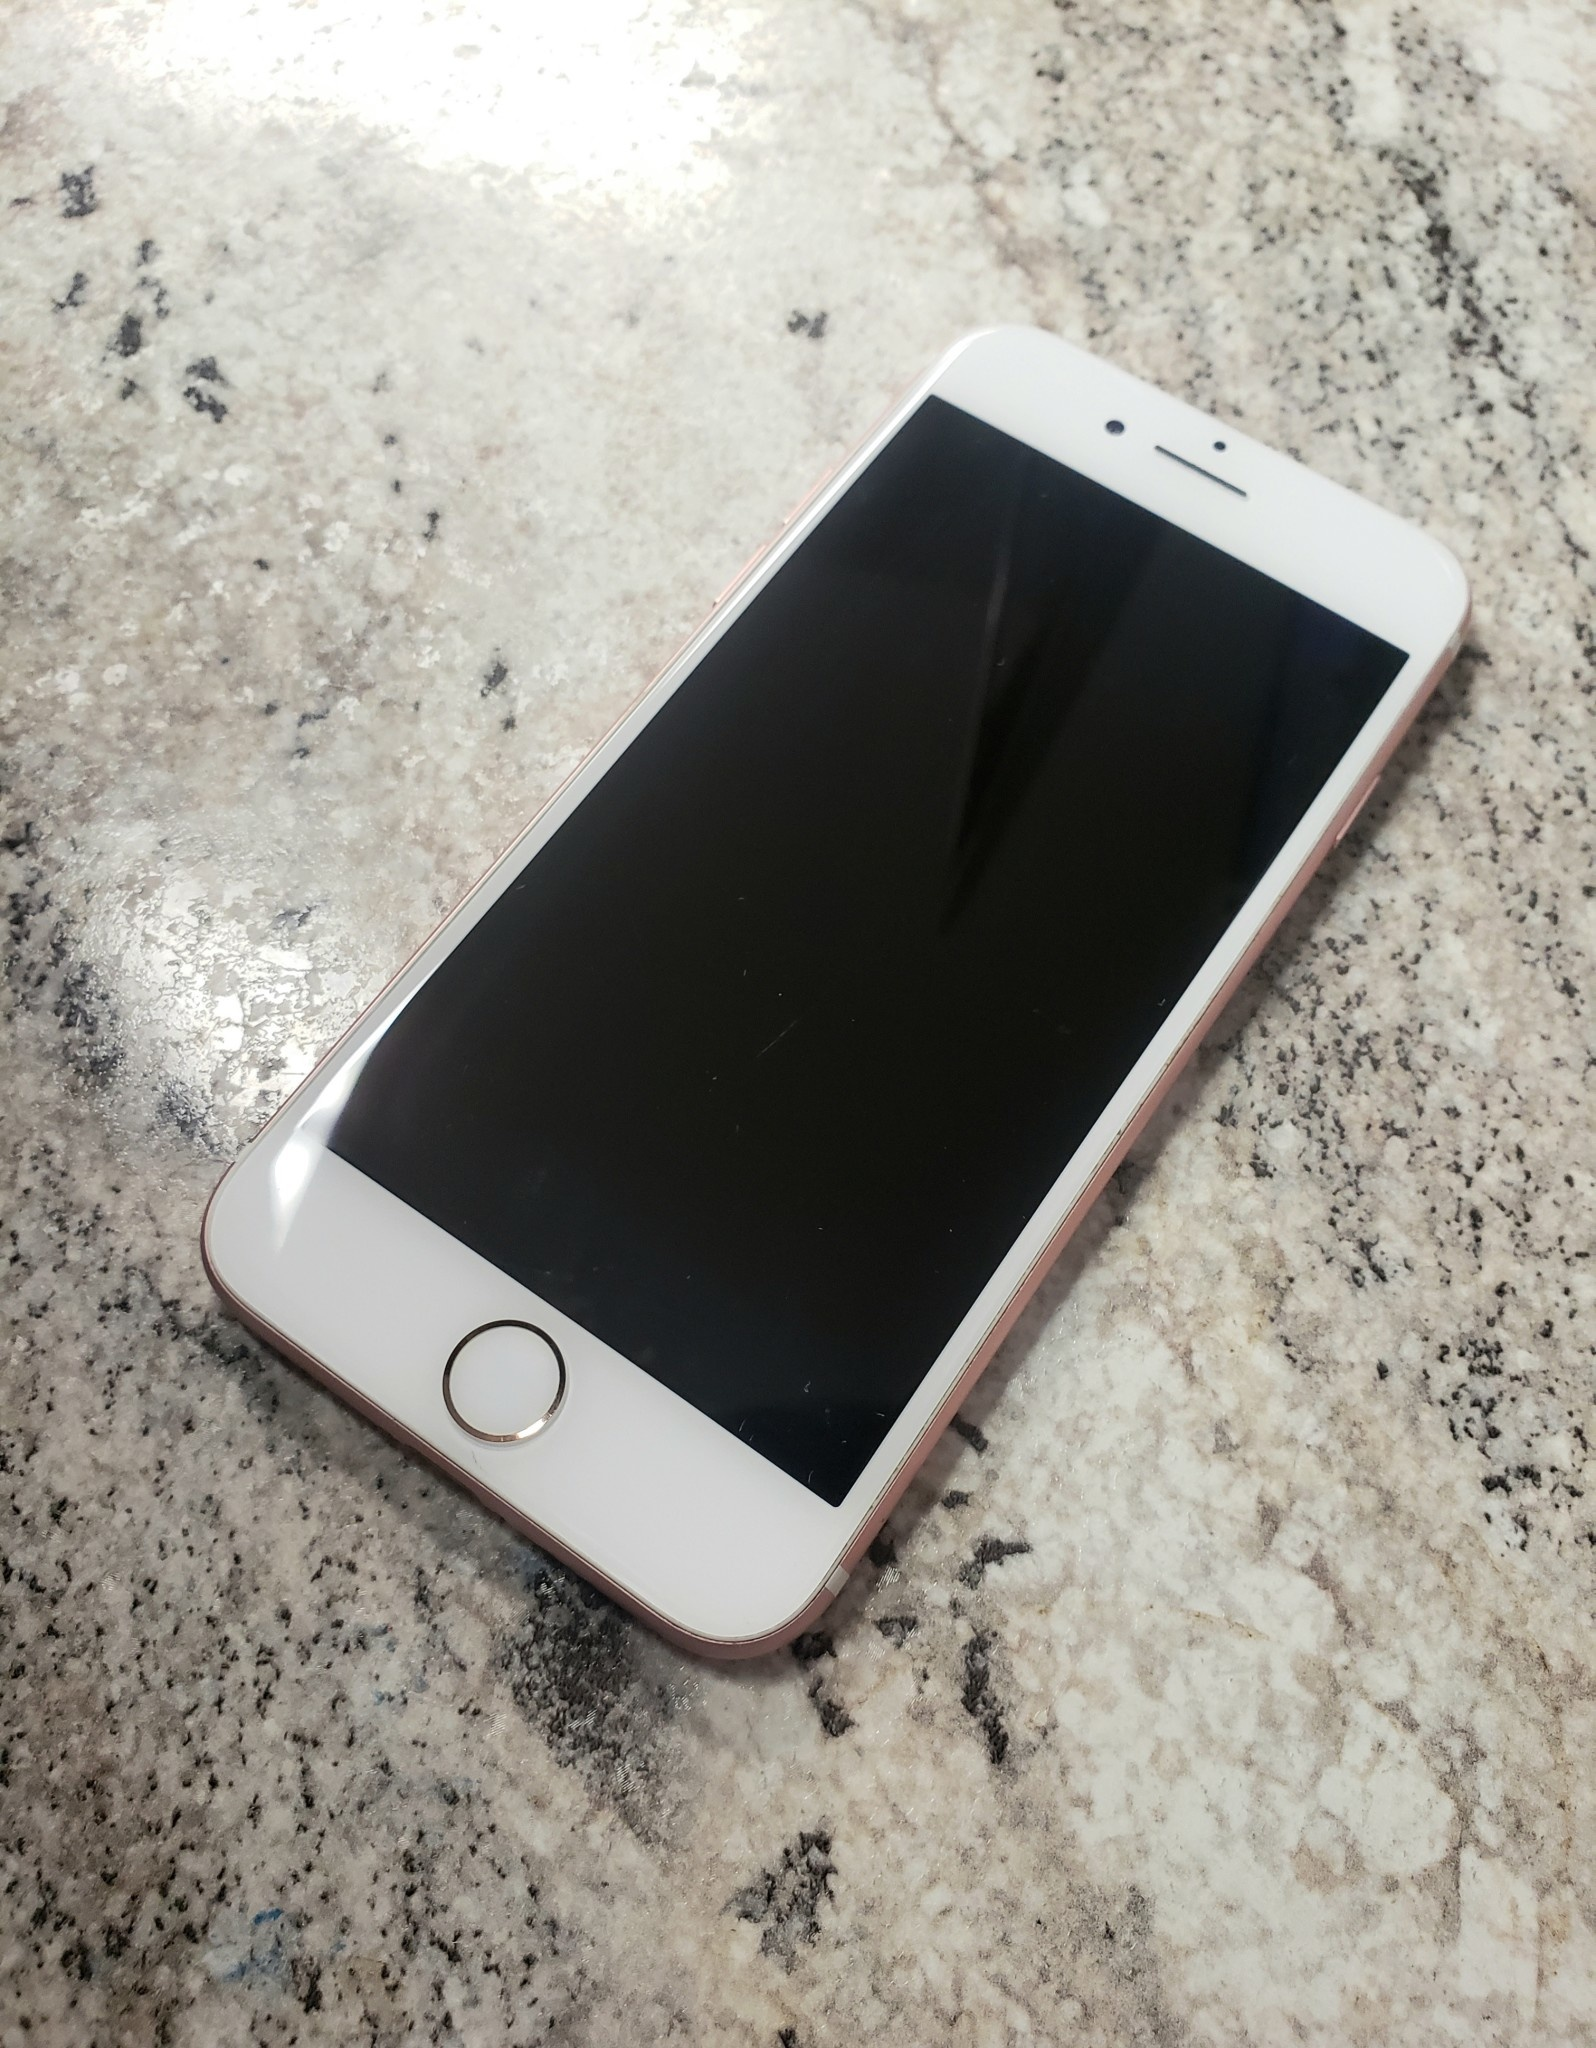 T-Mobile/MetroPCS - iPhone 7 - 256GB - Rose Gold - Fair Condition